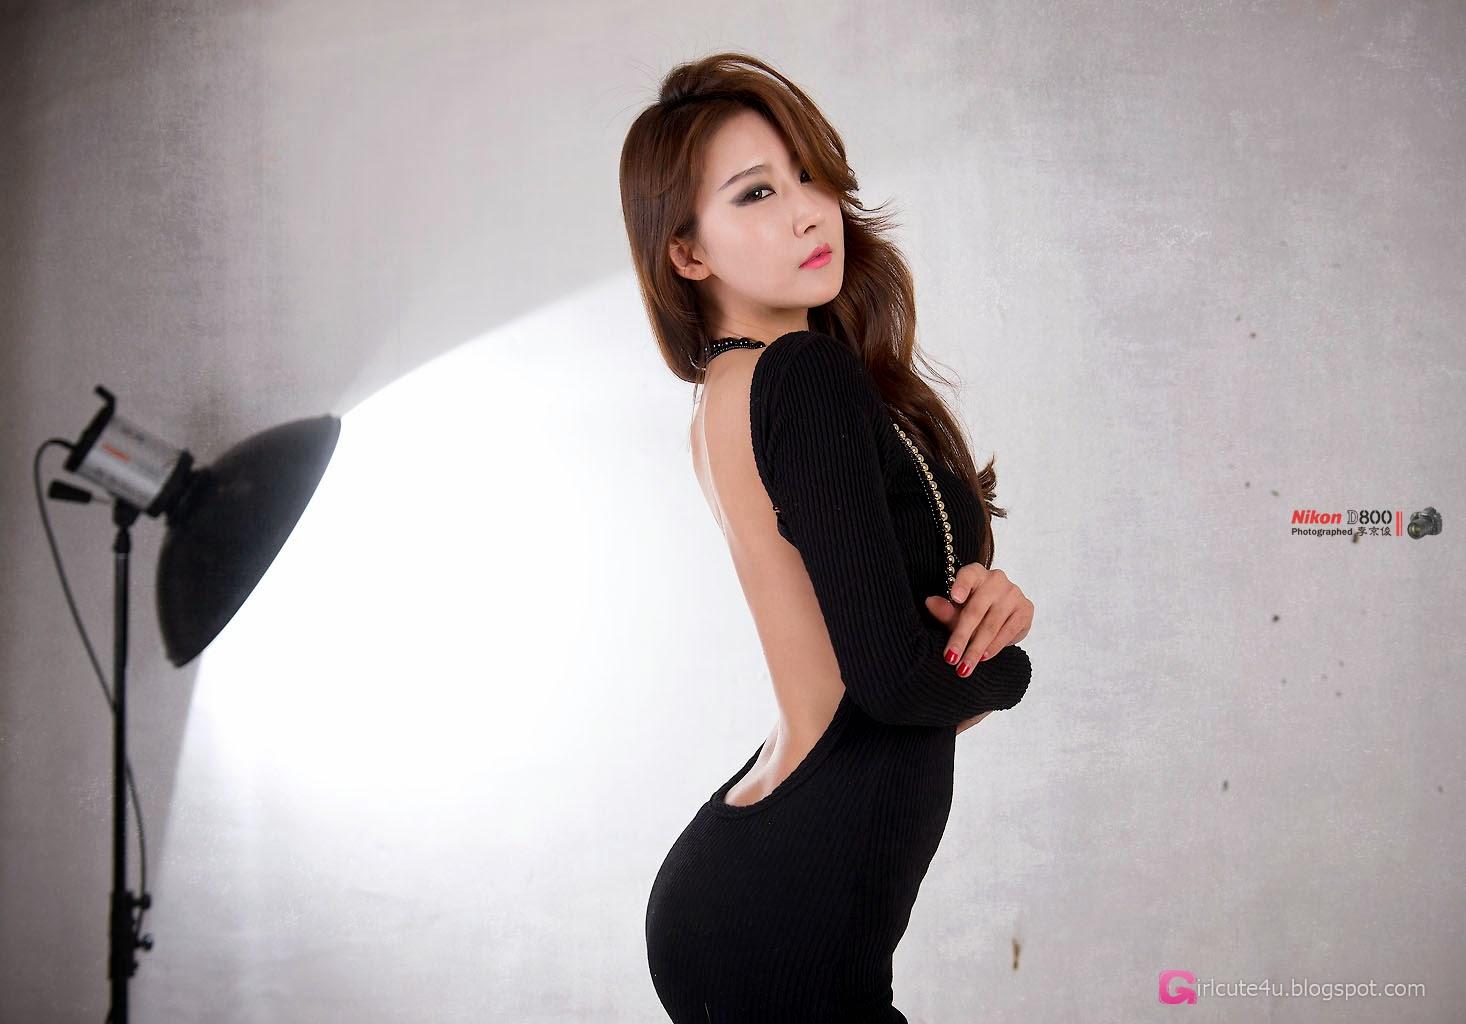 1 Park Hyun Sun - Studio Photo Shoot, 3 Different Outfits - very cute asian girl-girlcute4u.blogspot.com